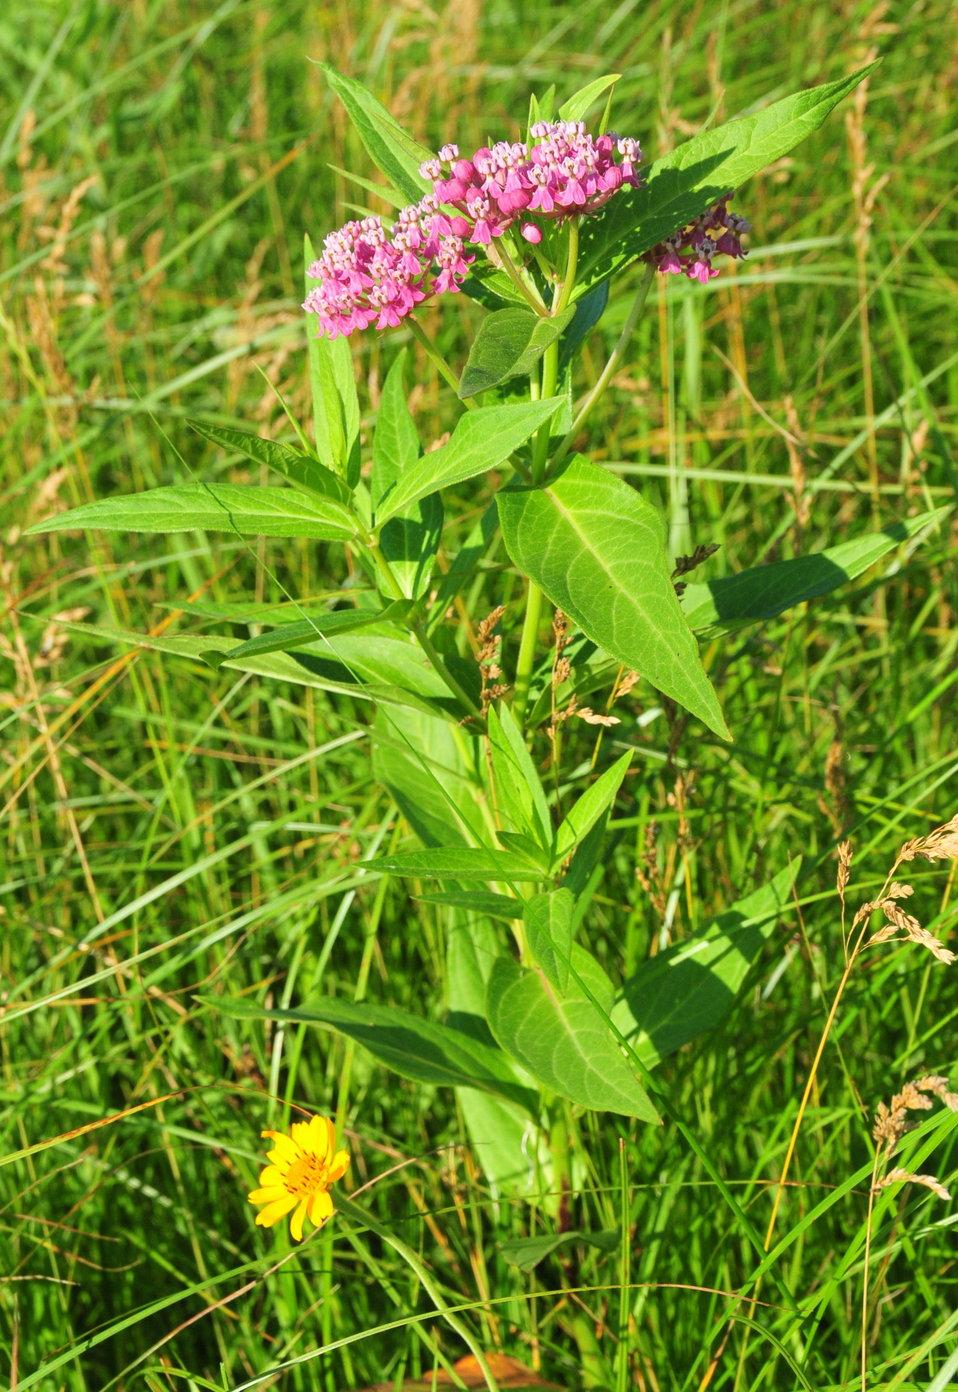 Swamp milkweed (Asclepias incarnata) Sand Lake Wetland Management District 01